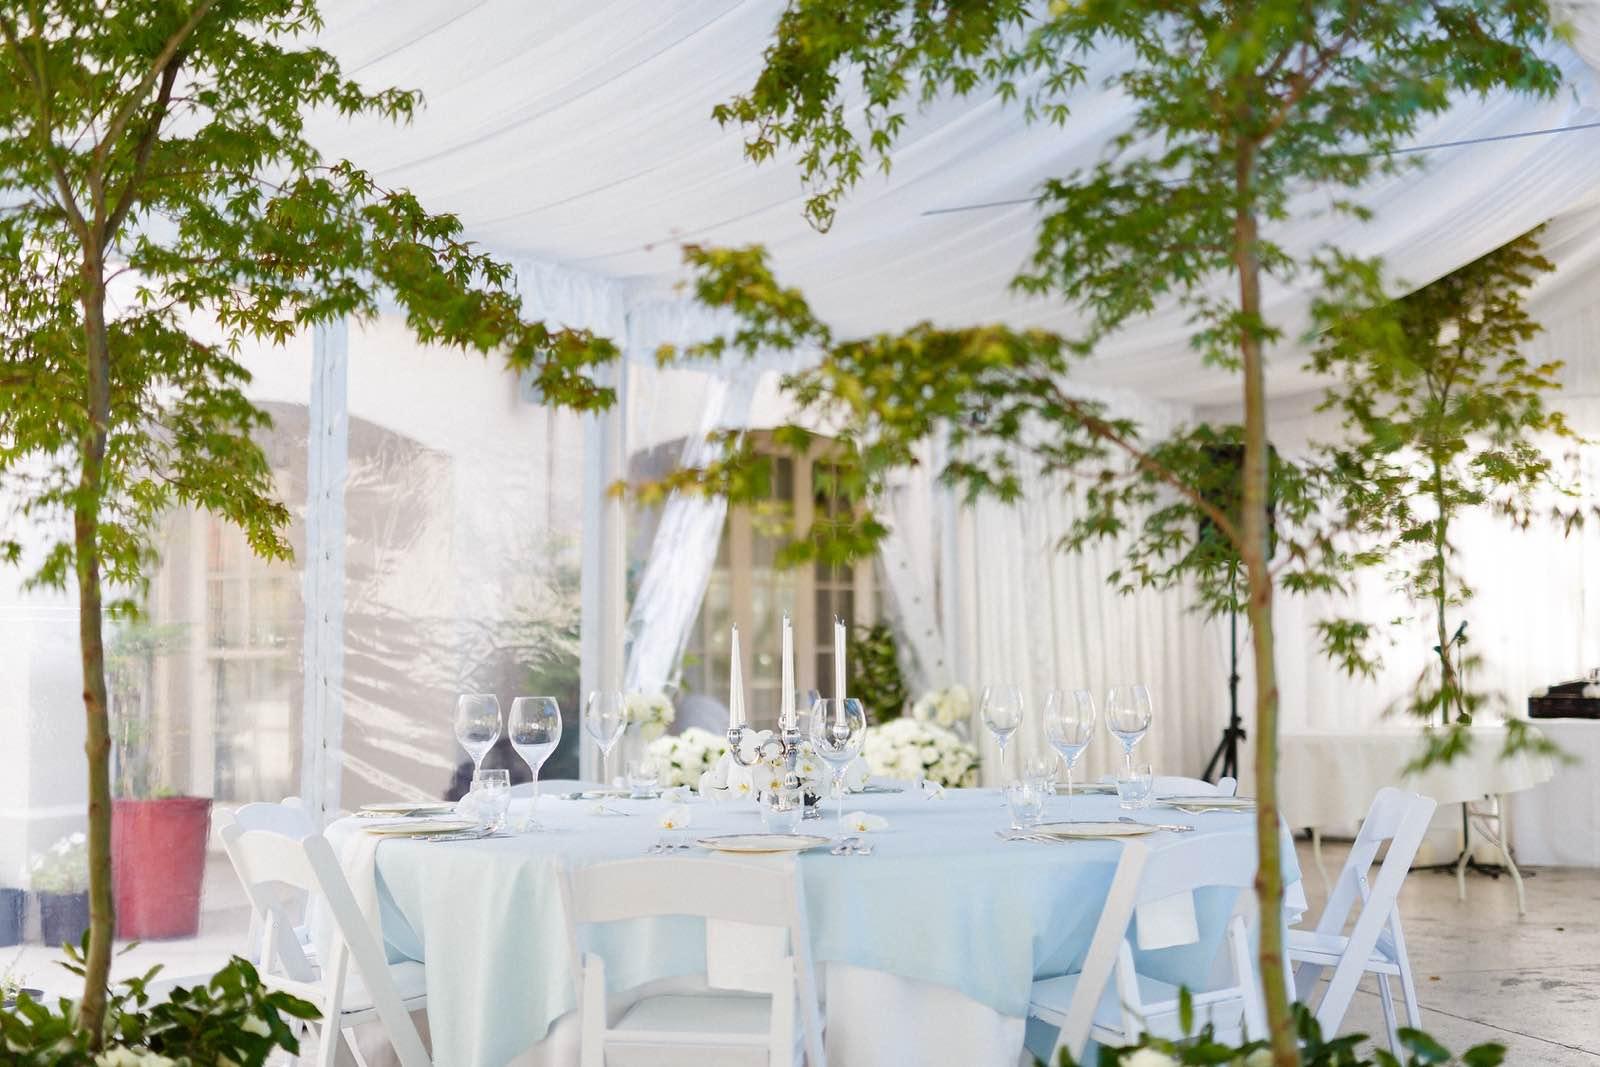 nz wedding dinner table